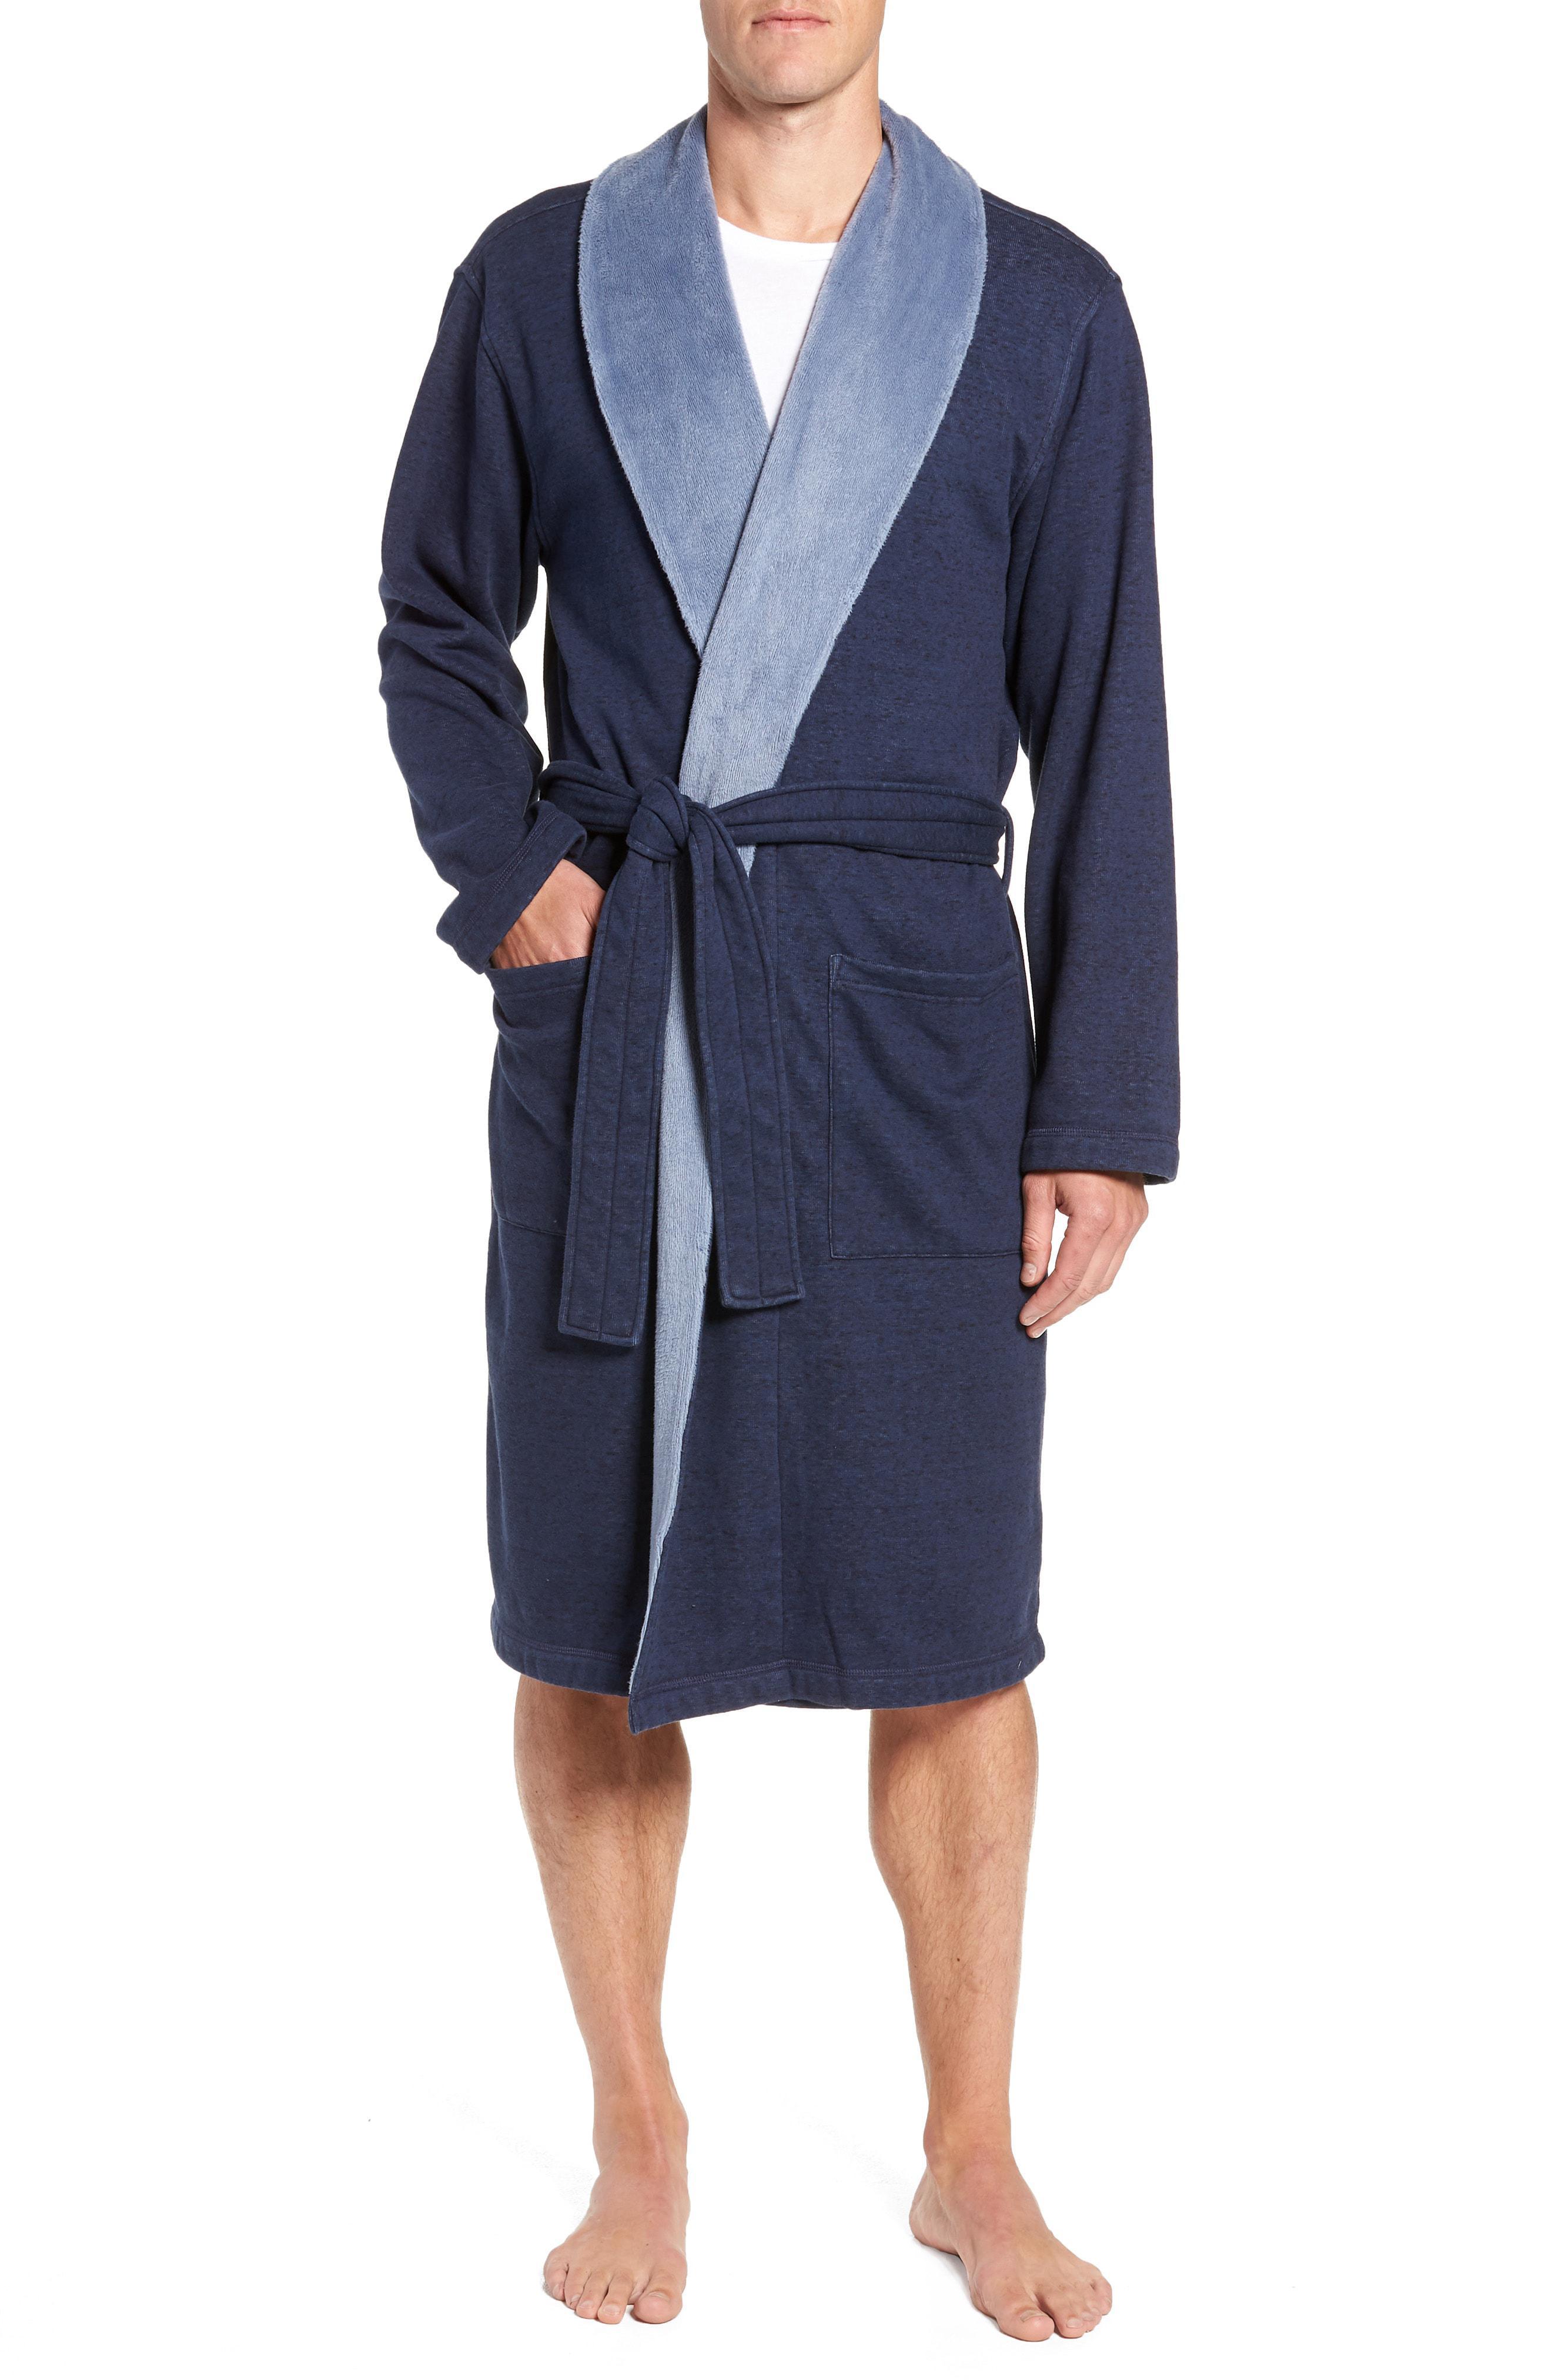 Lyst - Ugg Ugg Robinson Robe in Blue for Men 87c591ca0